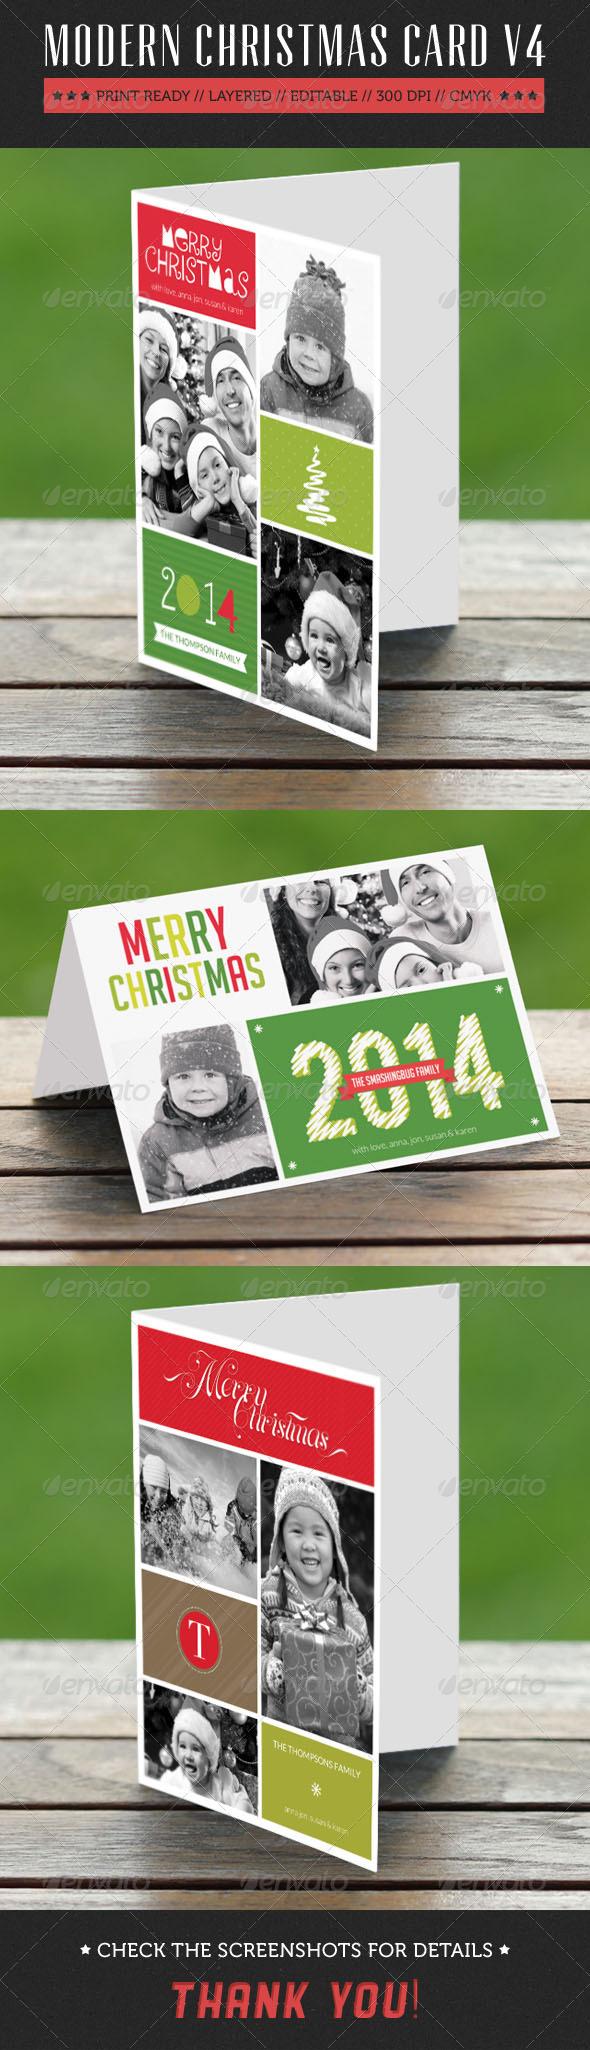 GraphicRiver Modern Christmas Card V4 6254882